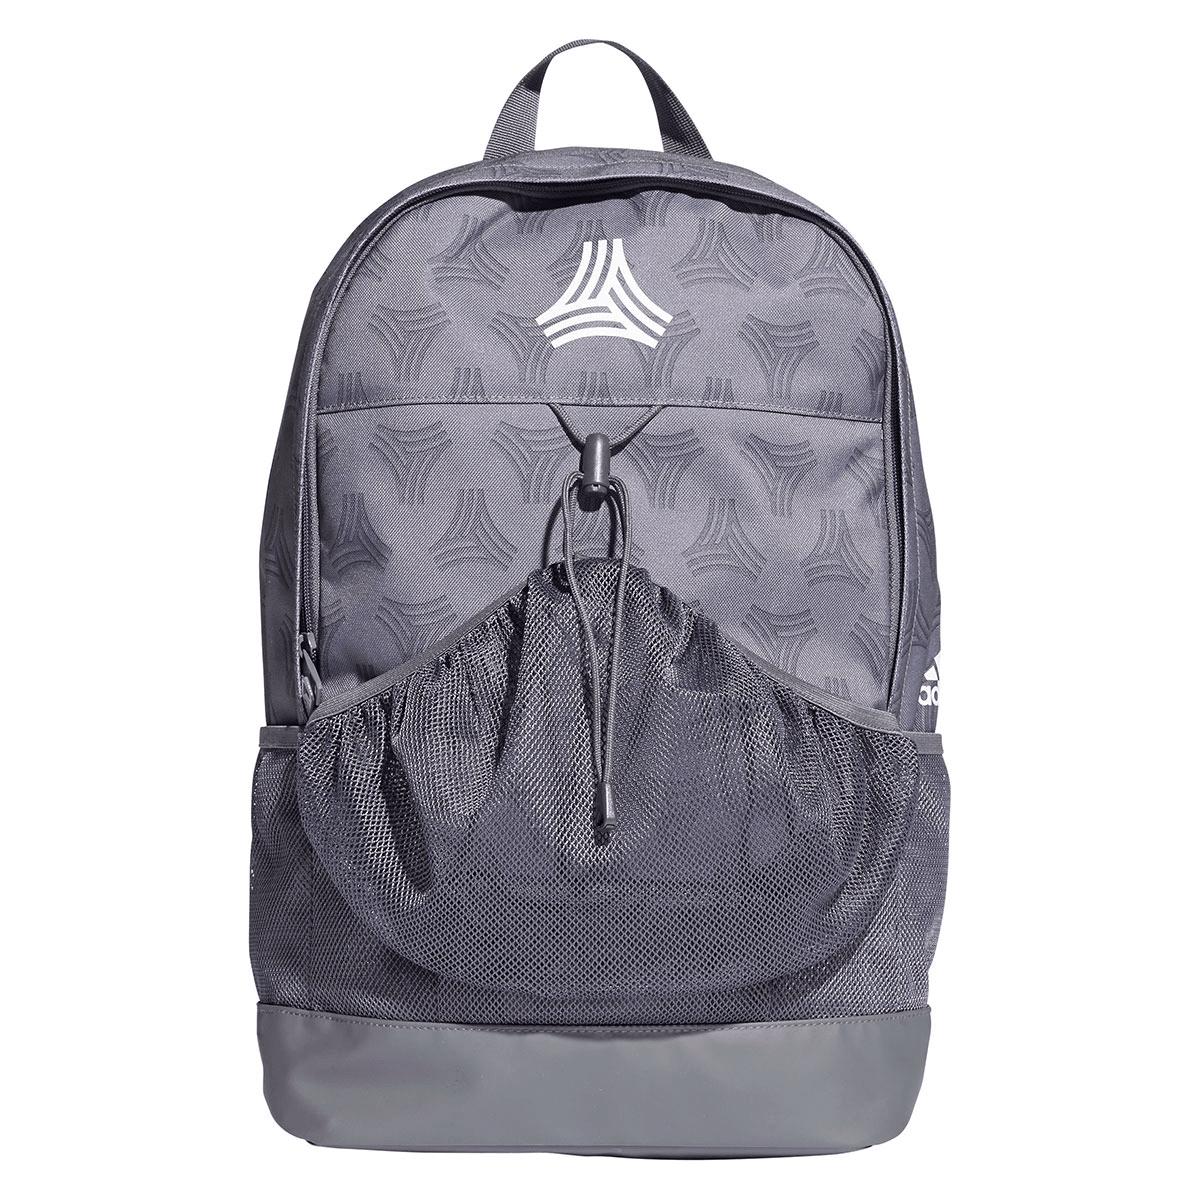 8e0deaf81e253 adidas Rucksack Football Street Backpack grau weiß - Fussball Shop